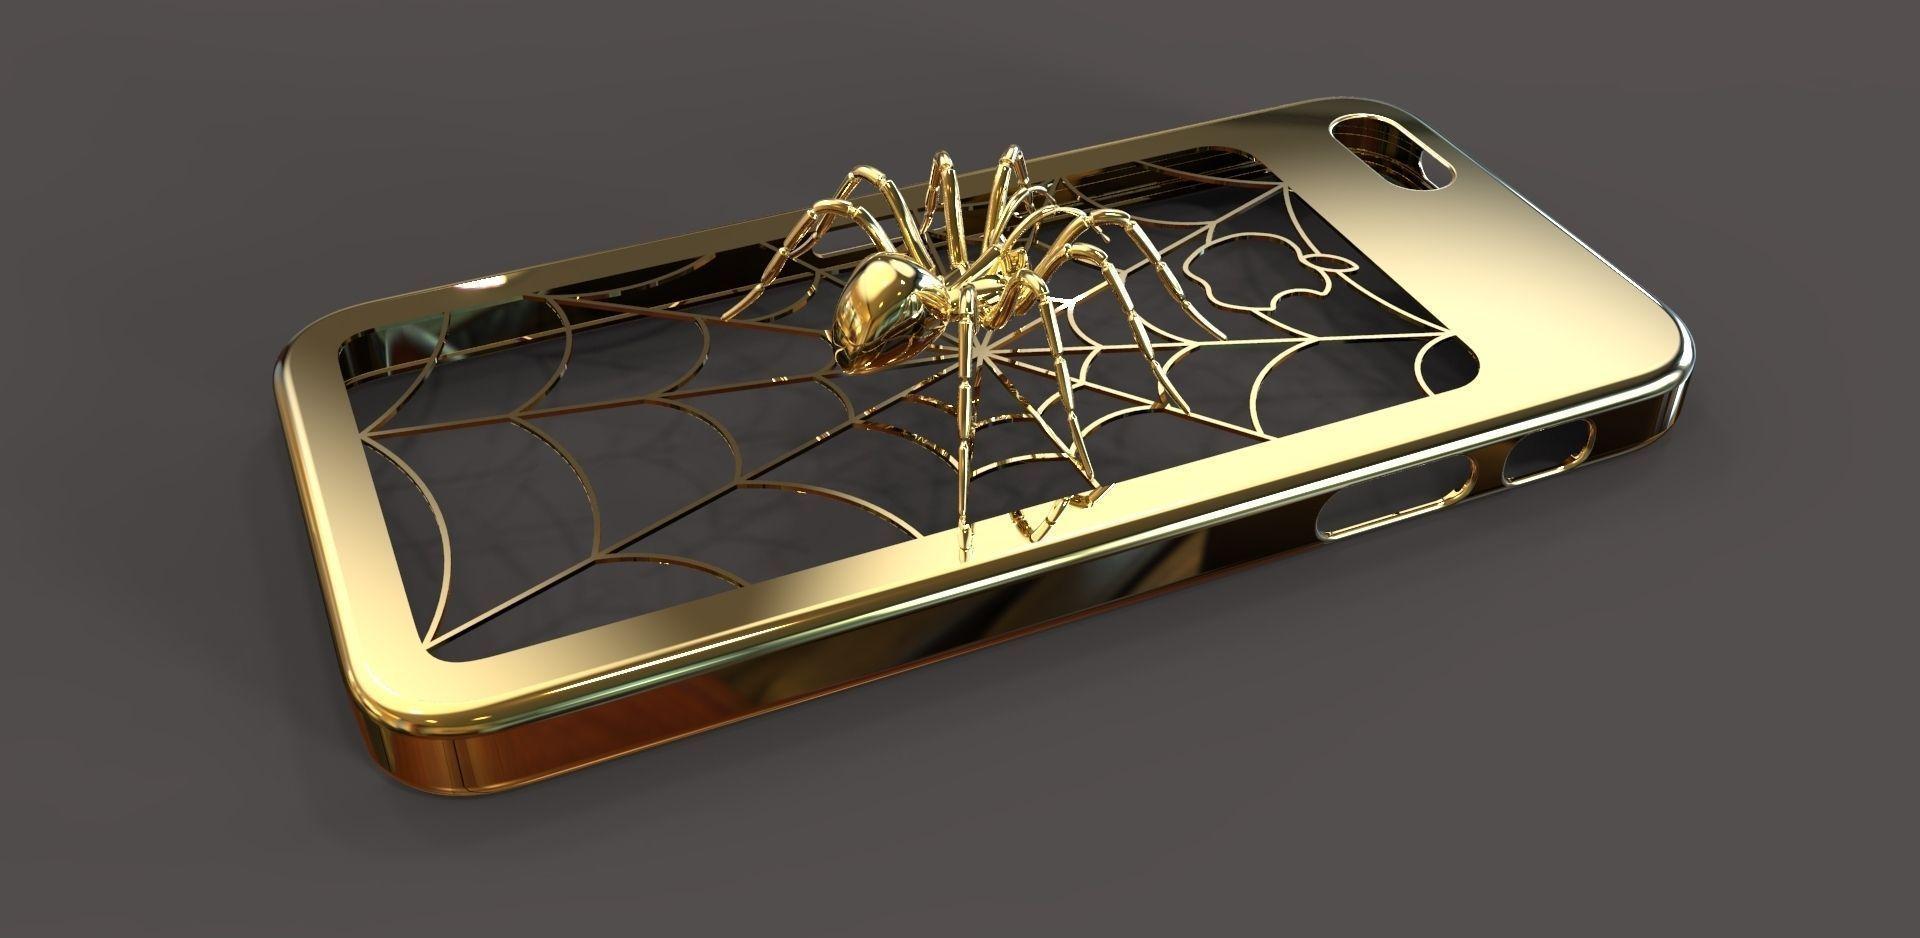 3d Print Model Iphone 5 Spider Case Cgtrader 1 Wrl Wrz